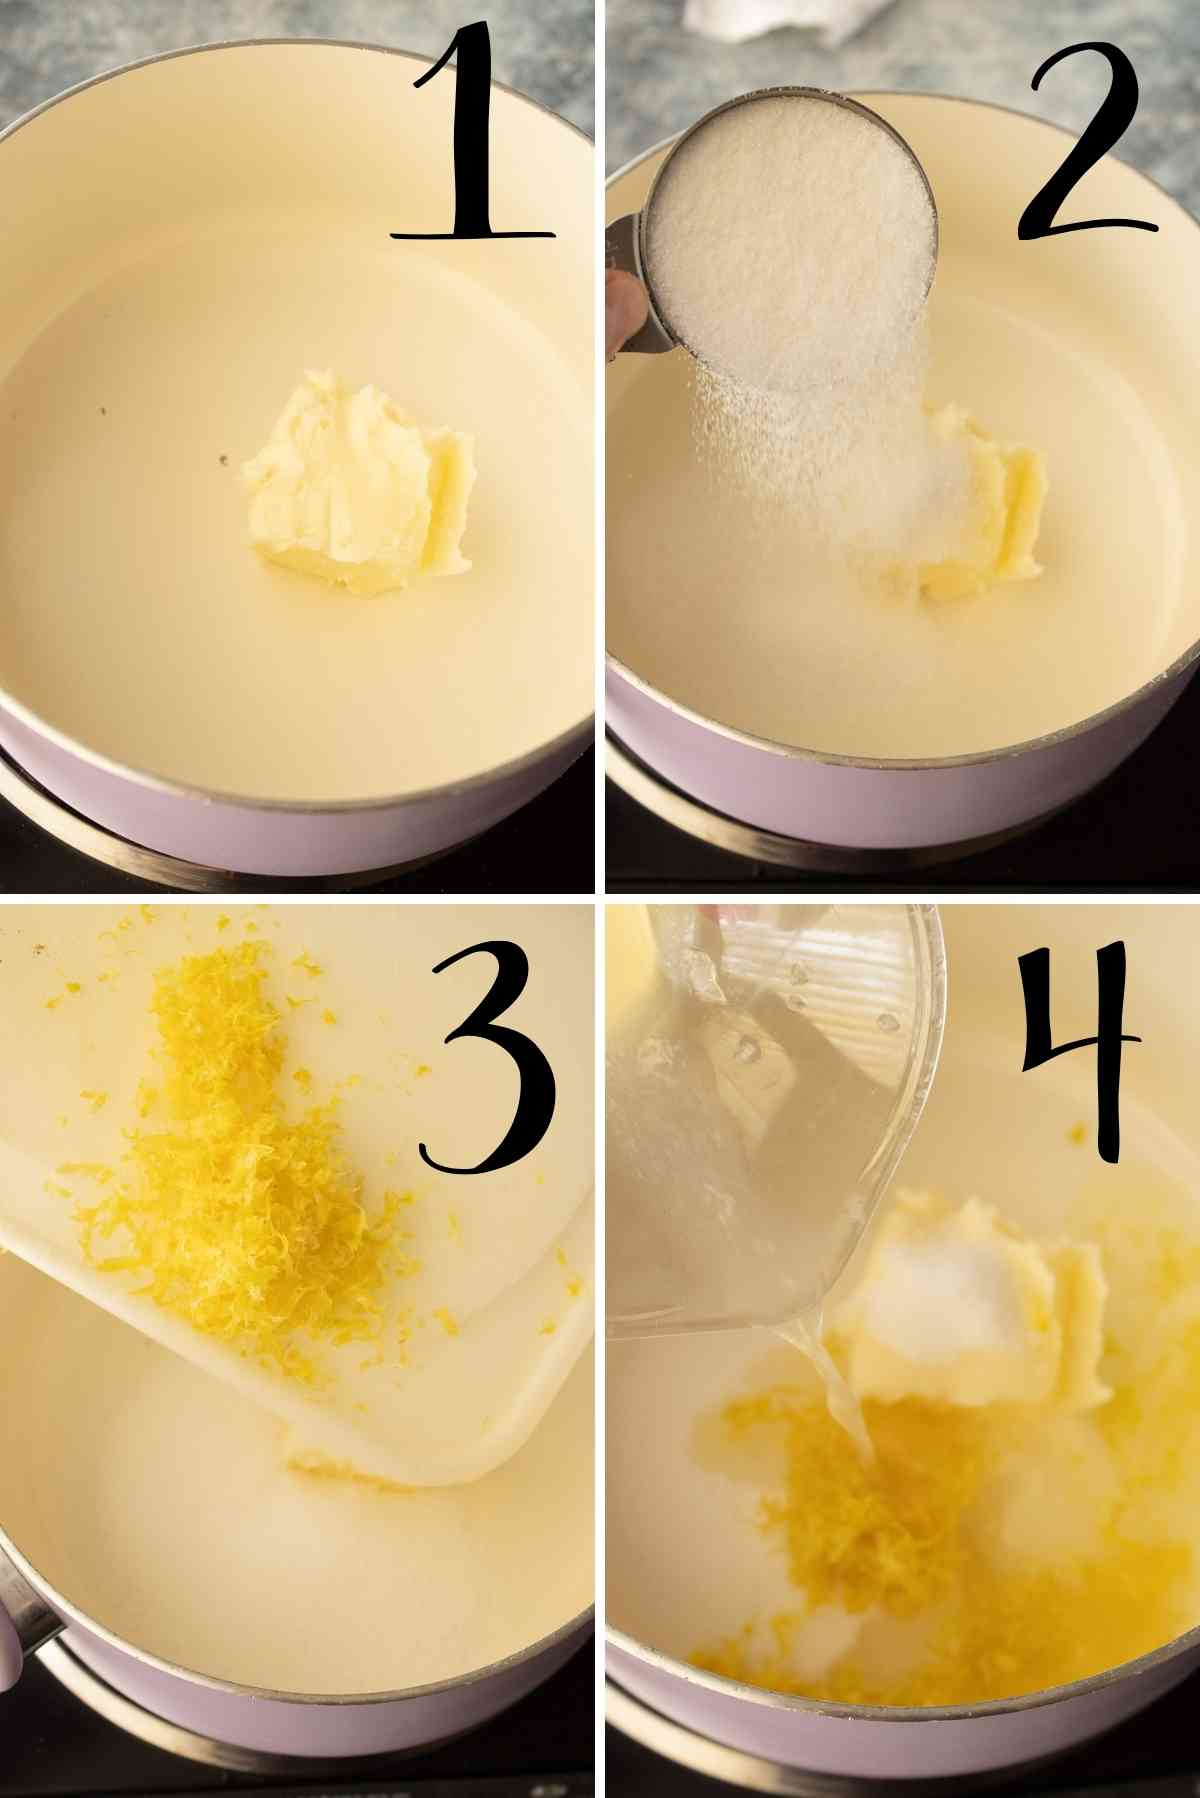 Bring butter, sugar, lemon zest and lemon juice to a boil.